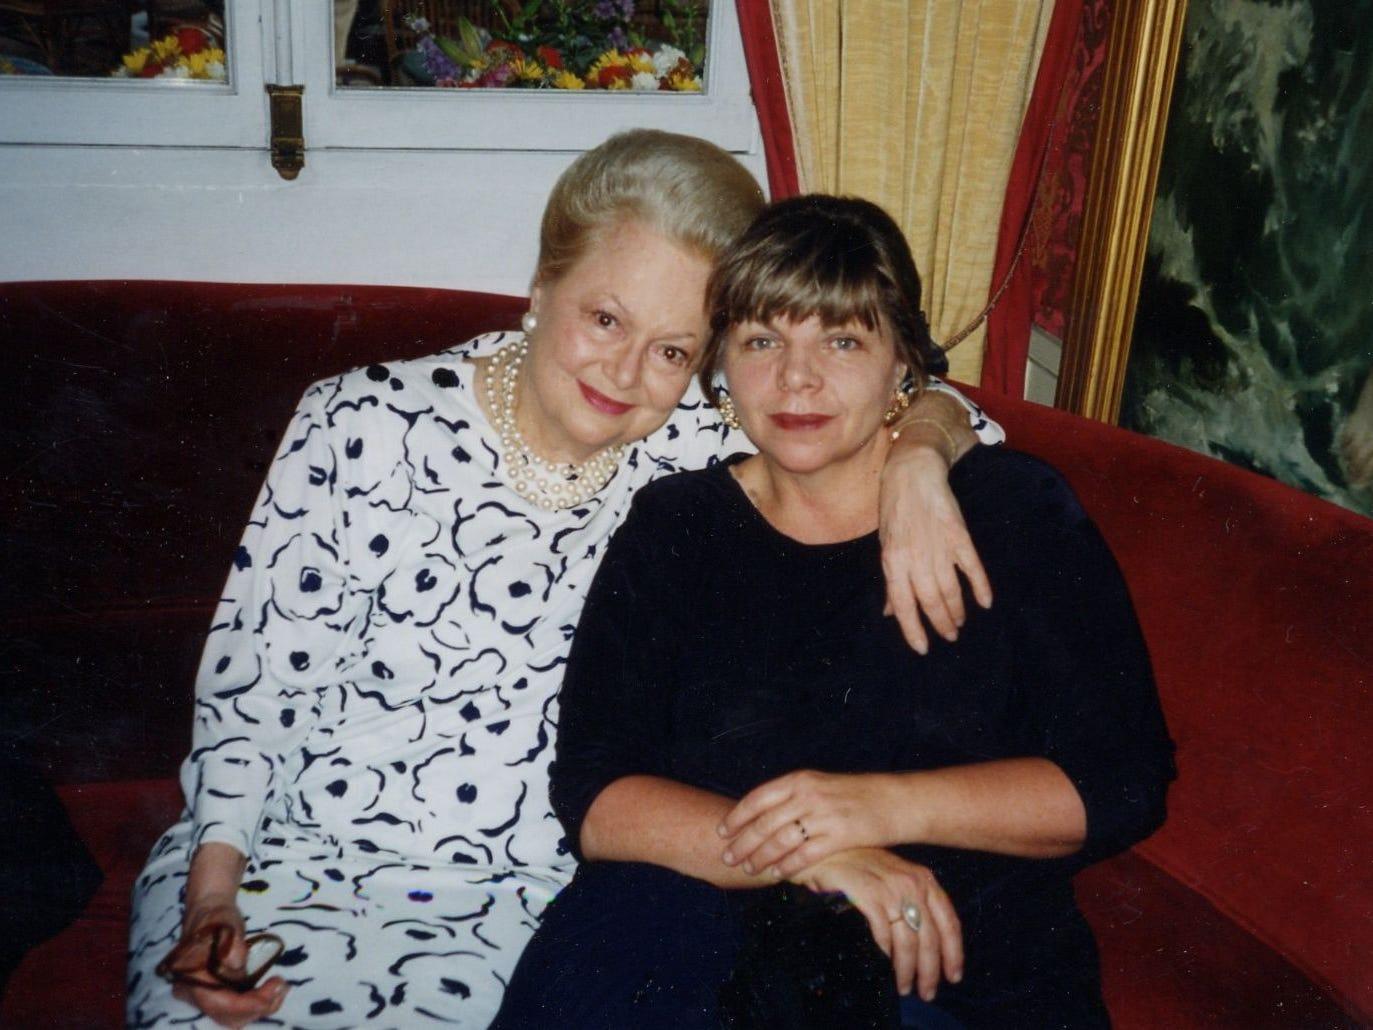 Deborah Potter, right, sits with aunt Olivia de Havilland in Paris in 1996.